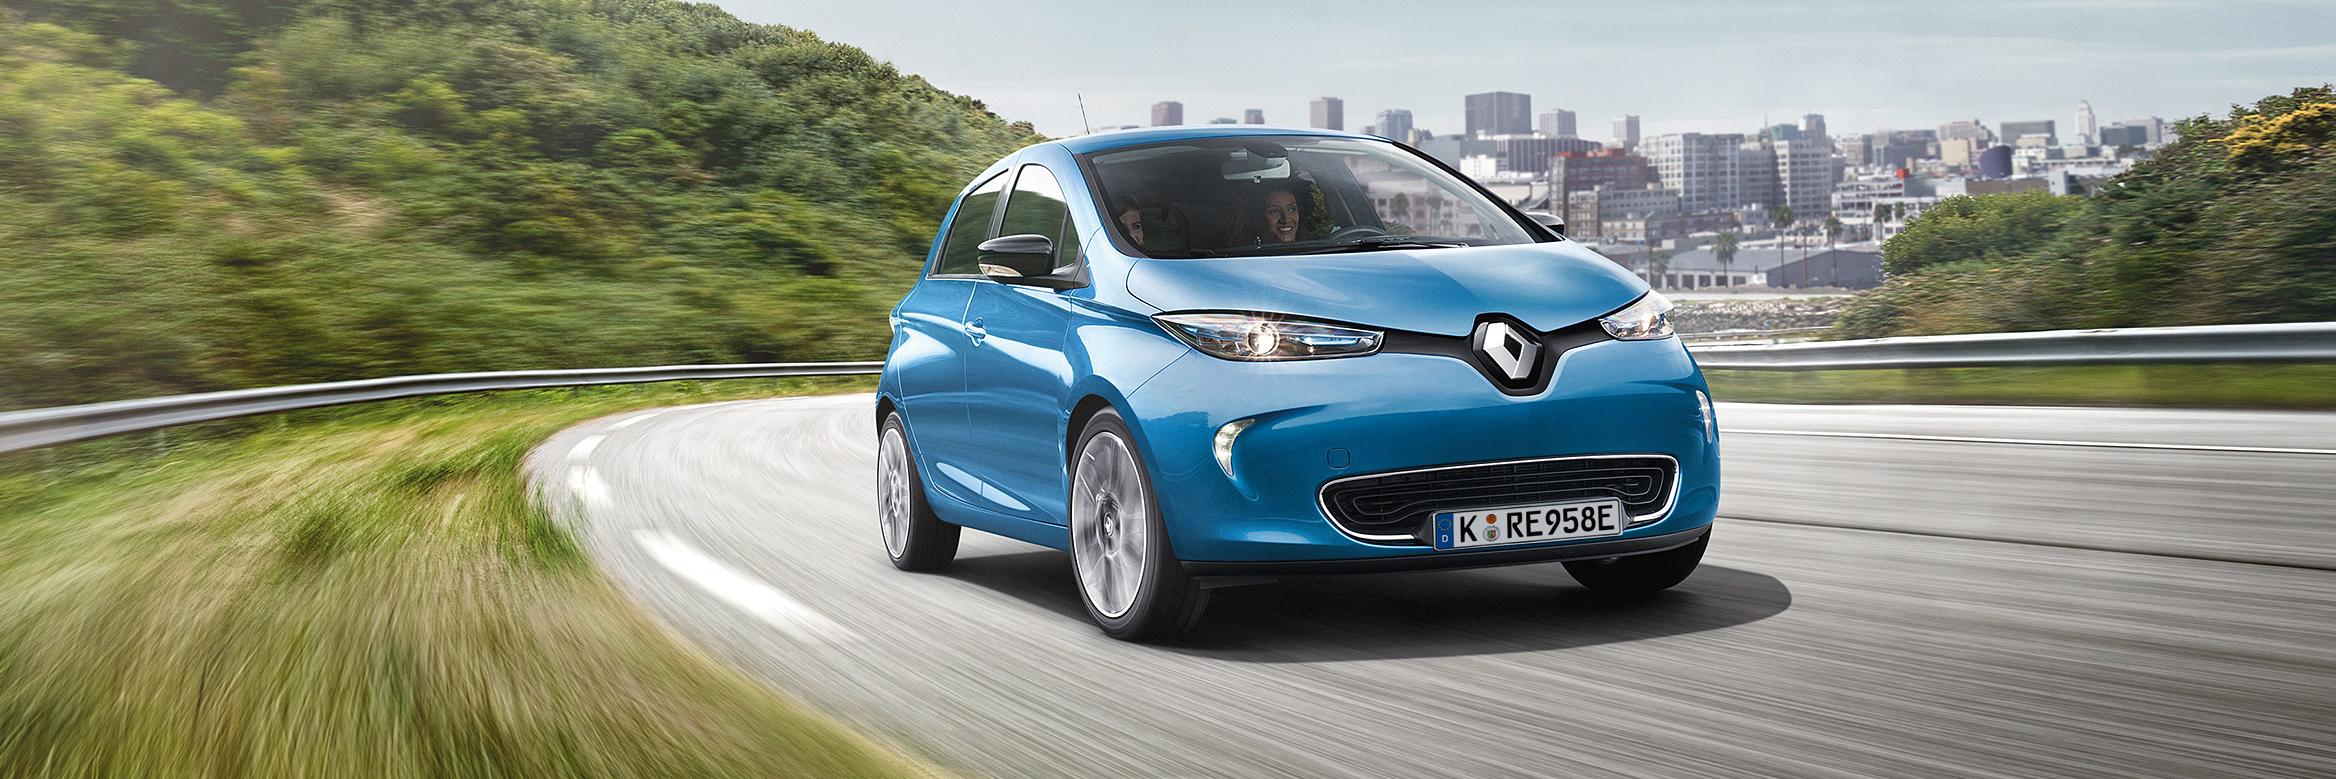 Testen Sie den Renault ZOE jetzt 24 Stunden lang gratis